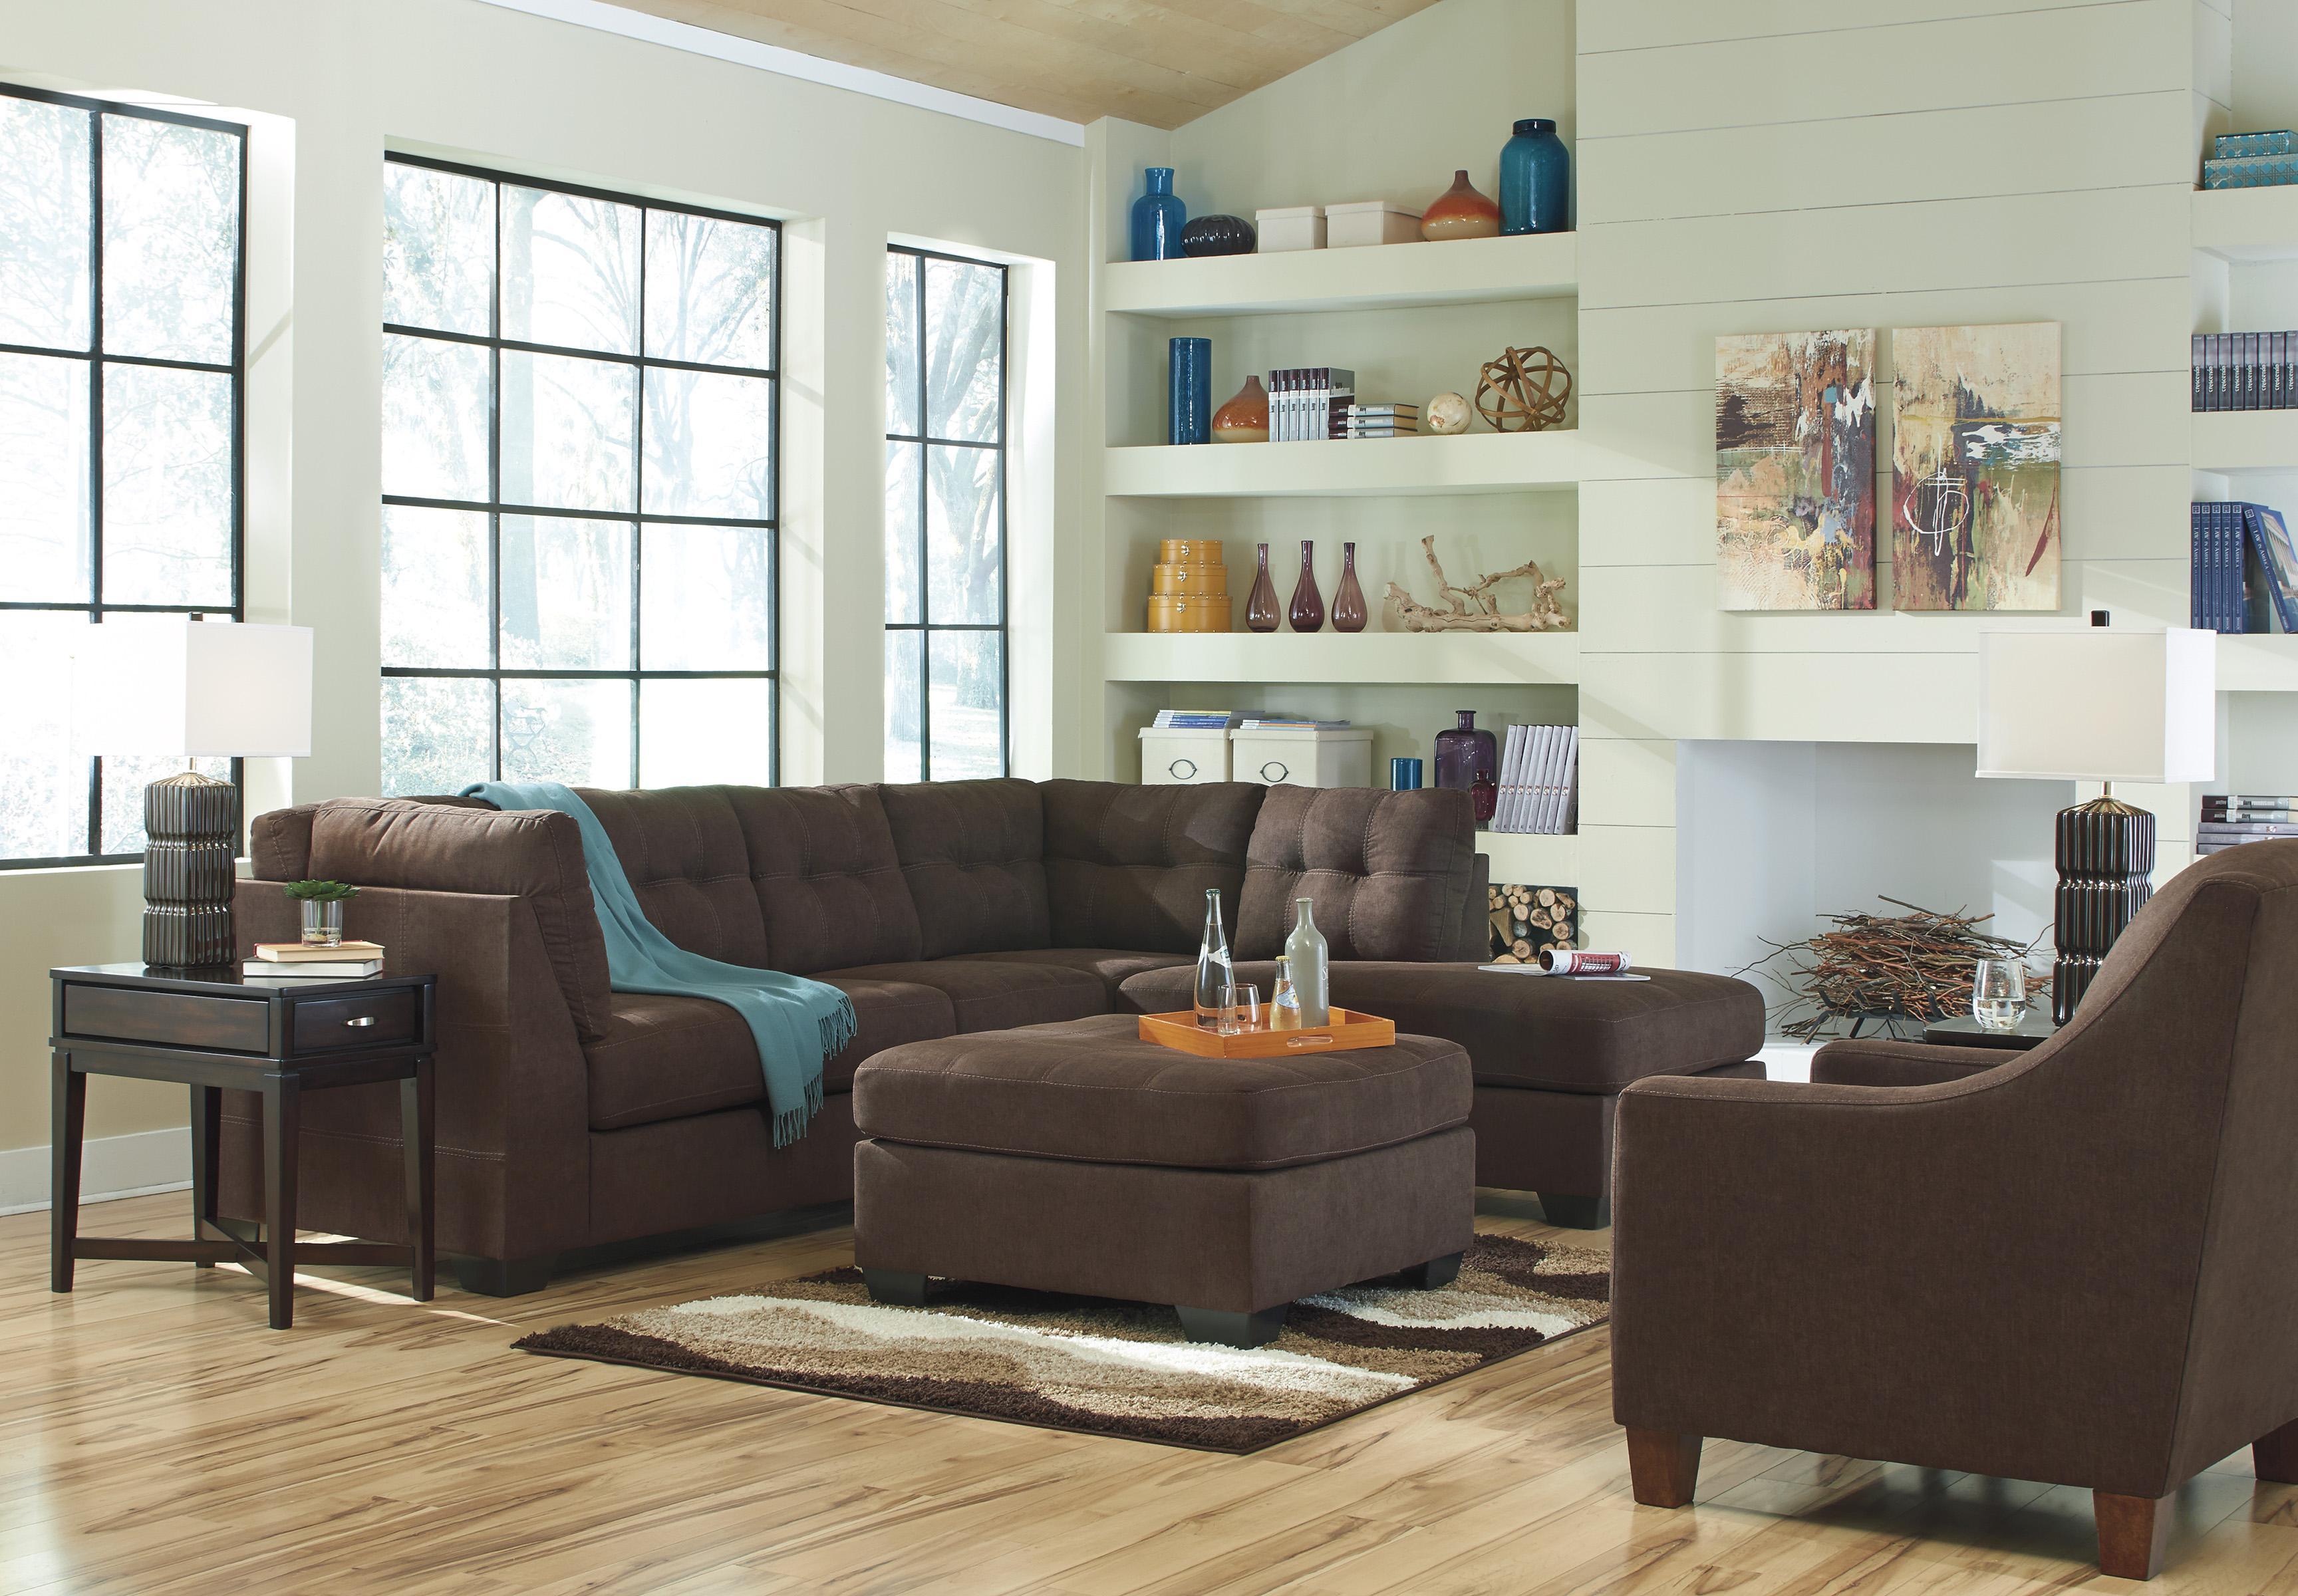 Ashley/Benchcraft Maier - Walnut Stationary Living Room Group - Item Number: 45201 Living Room Group 3